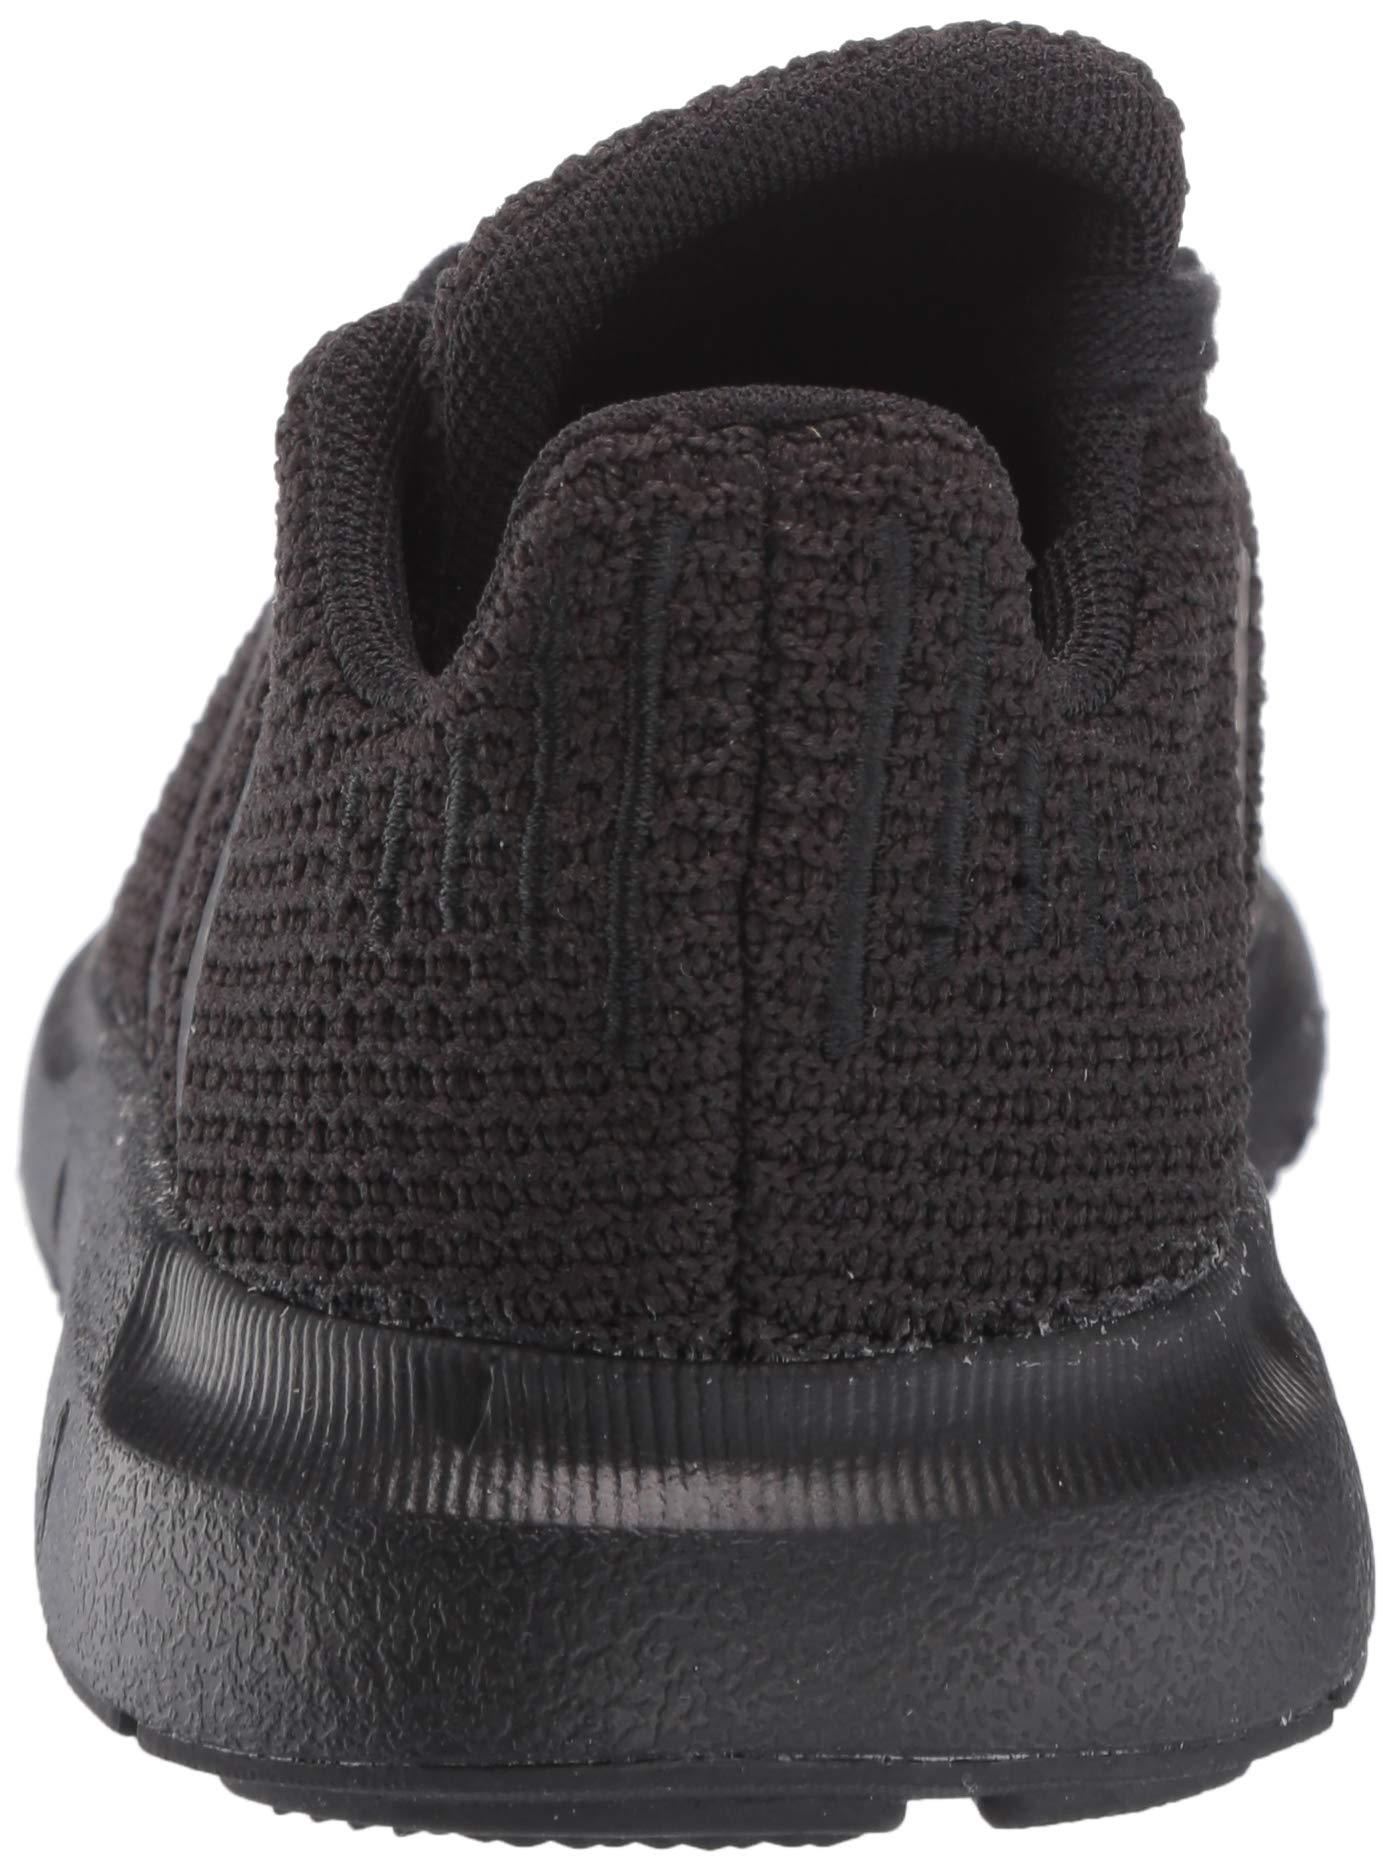 adidas Originals Baby Swift Running Shoe, Black, 5K M US Toddler by adidas Originals (Image #2)